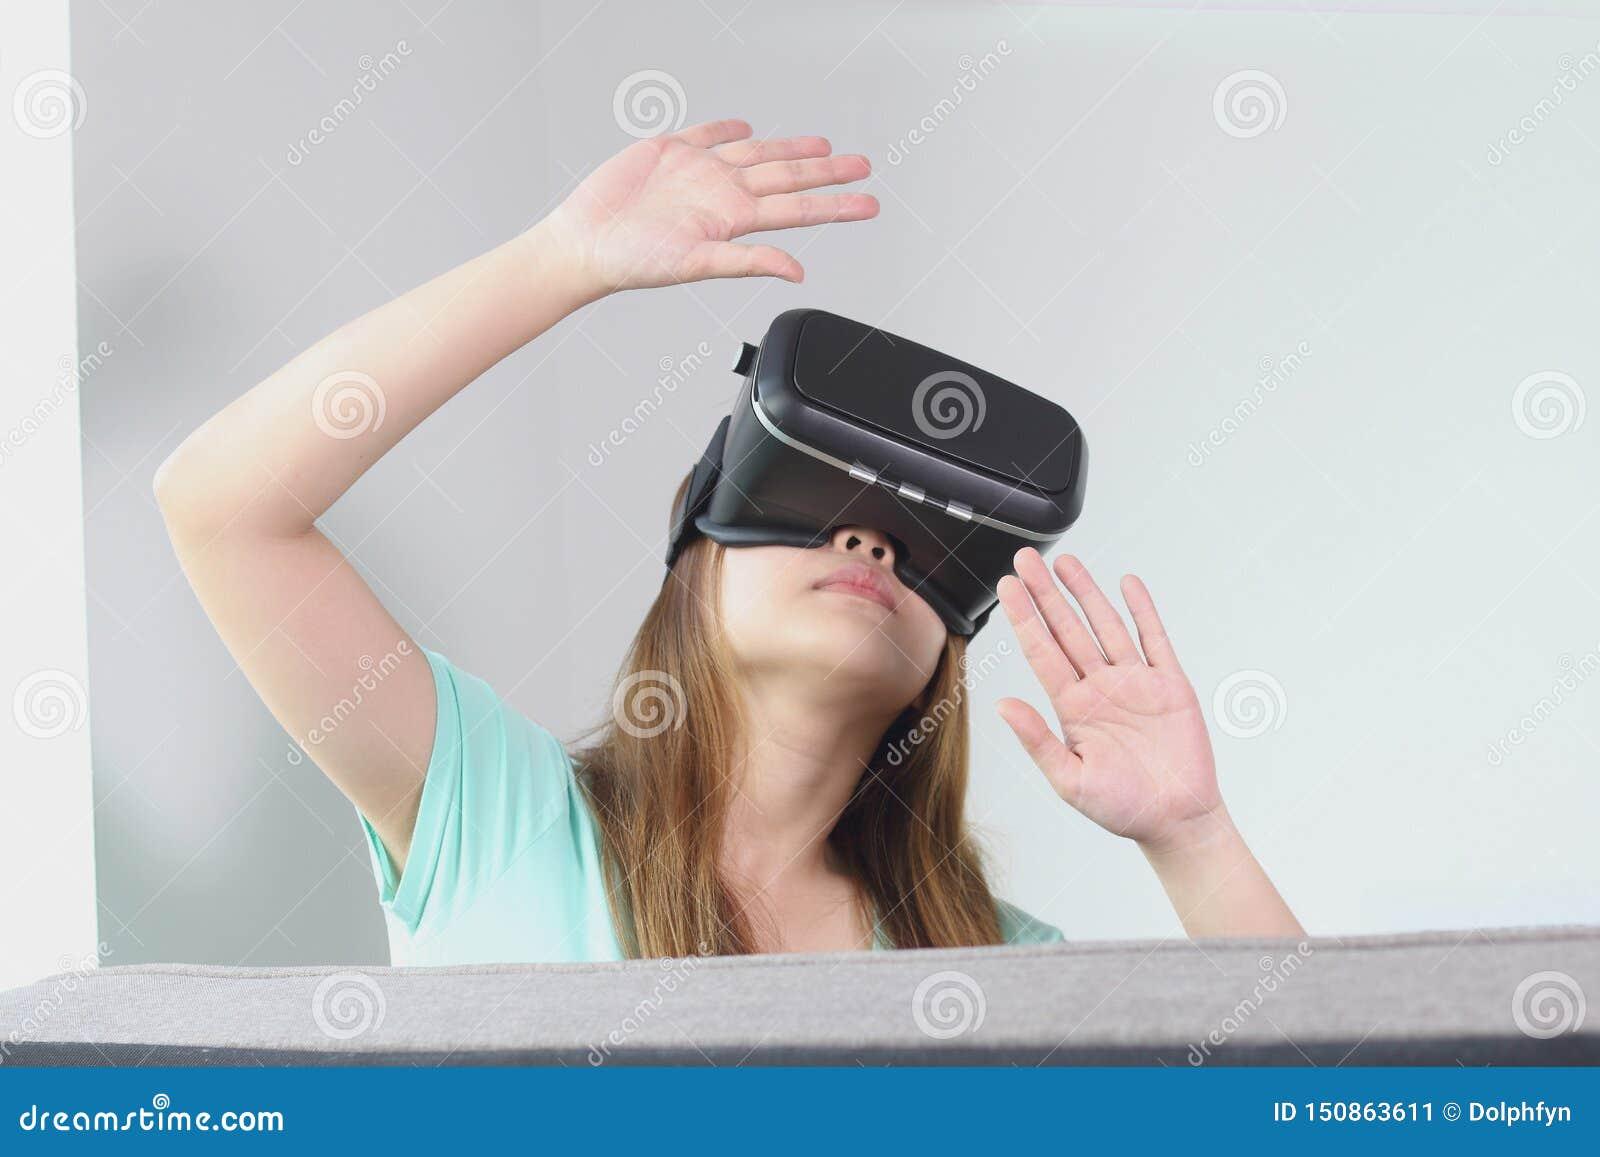 woman wearing virtual reality glasses by ReeldealHD